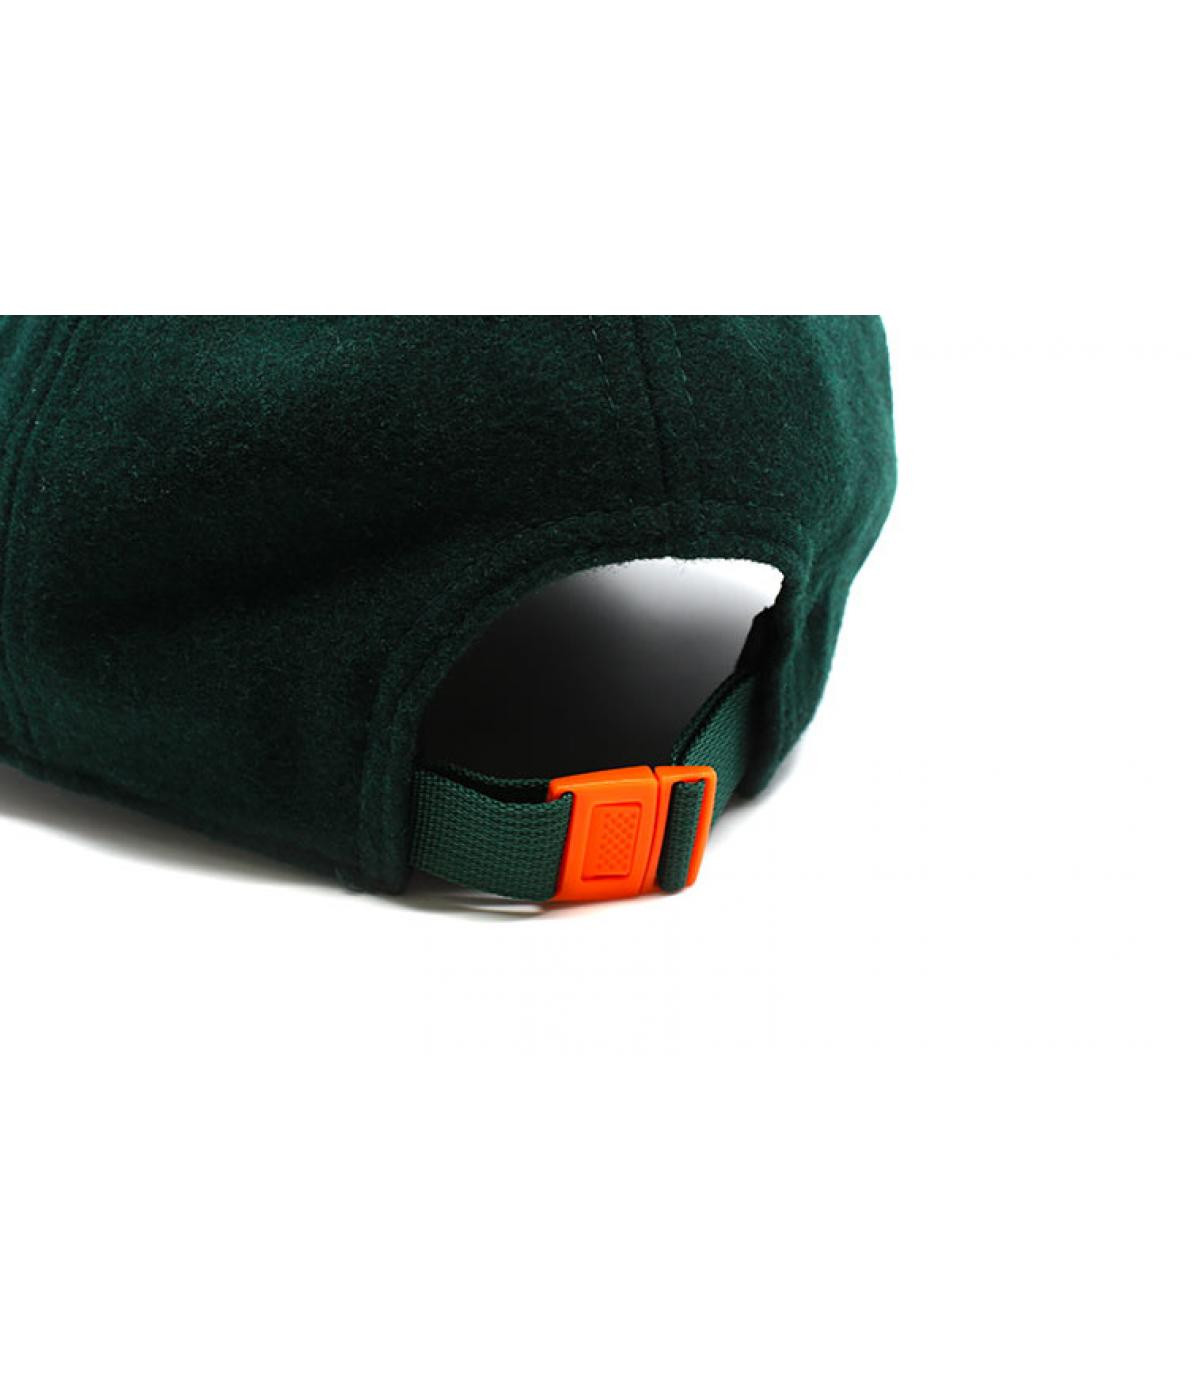 Details Cap Winter Utility Detroit Melton 9Forty dark green orange - Abbildung 5